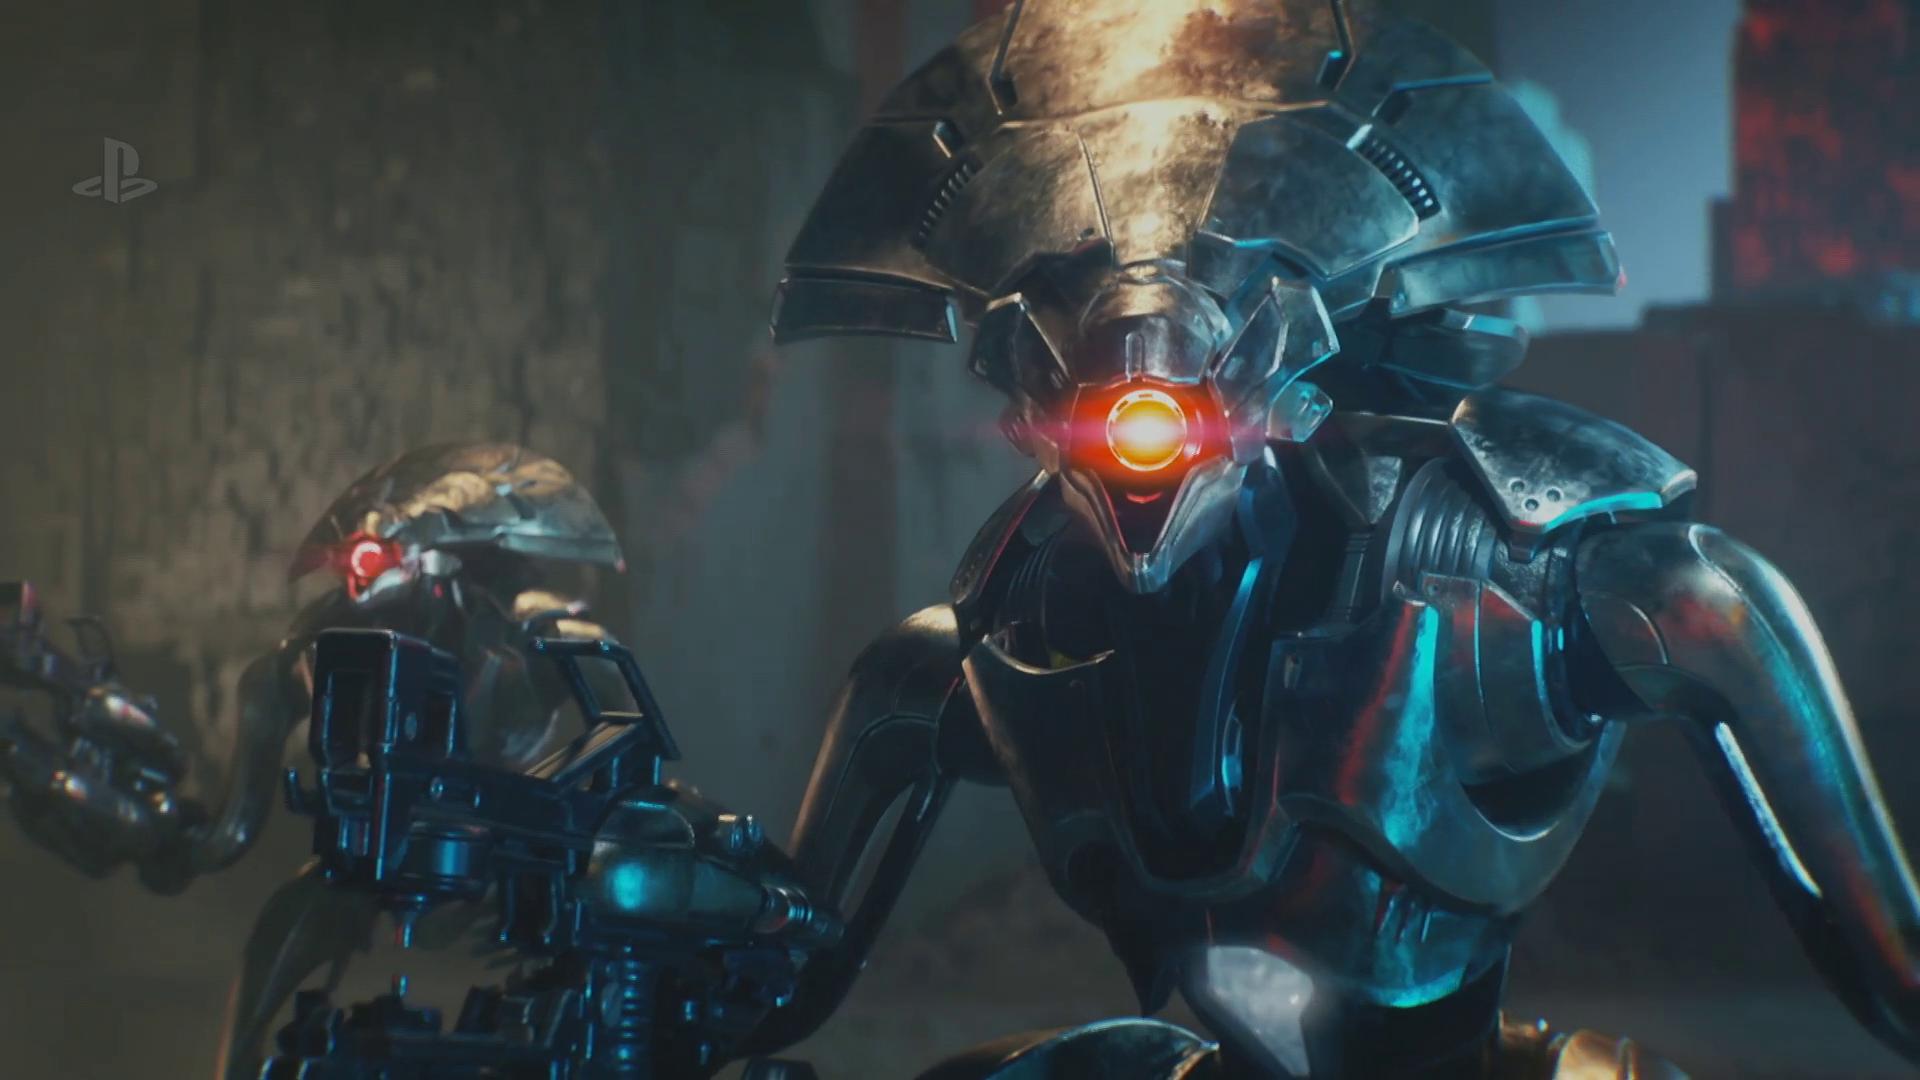 two Vex robots in Destiny 2